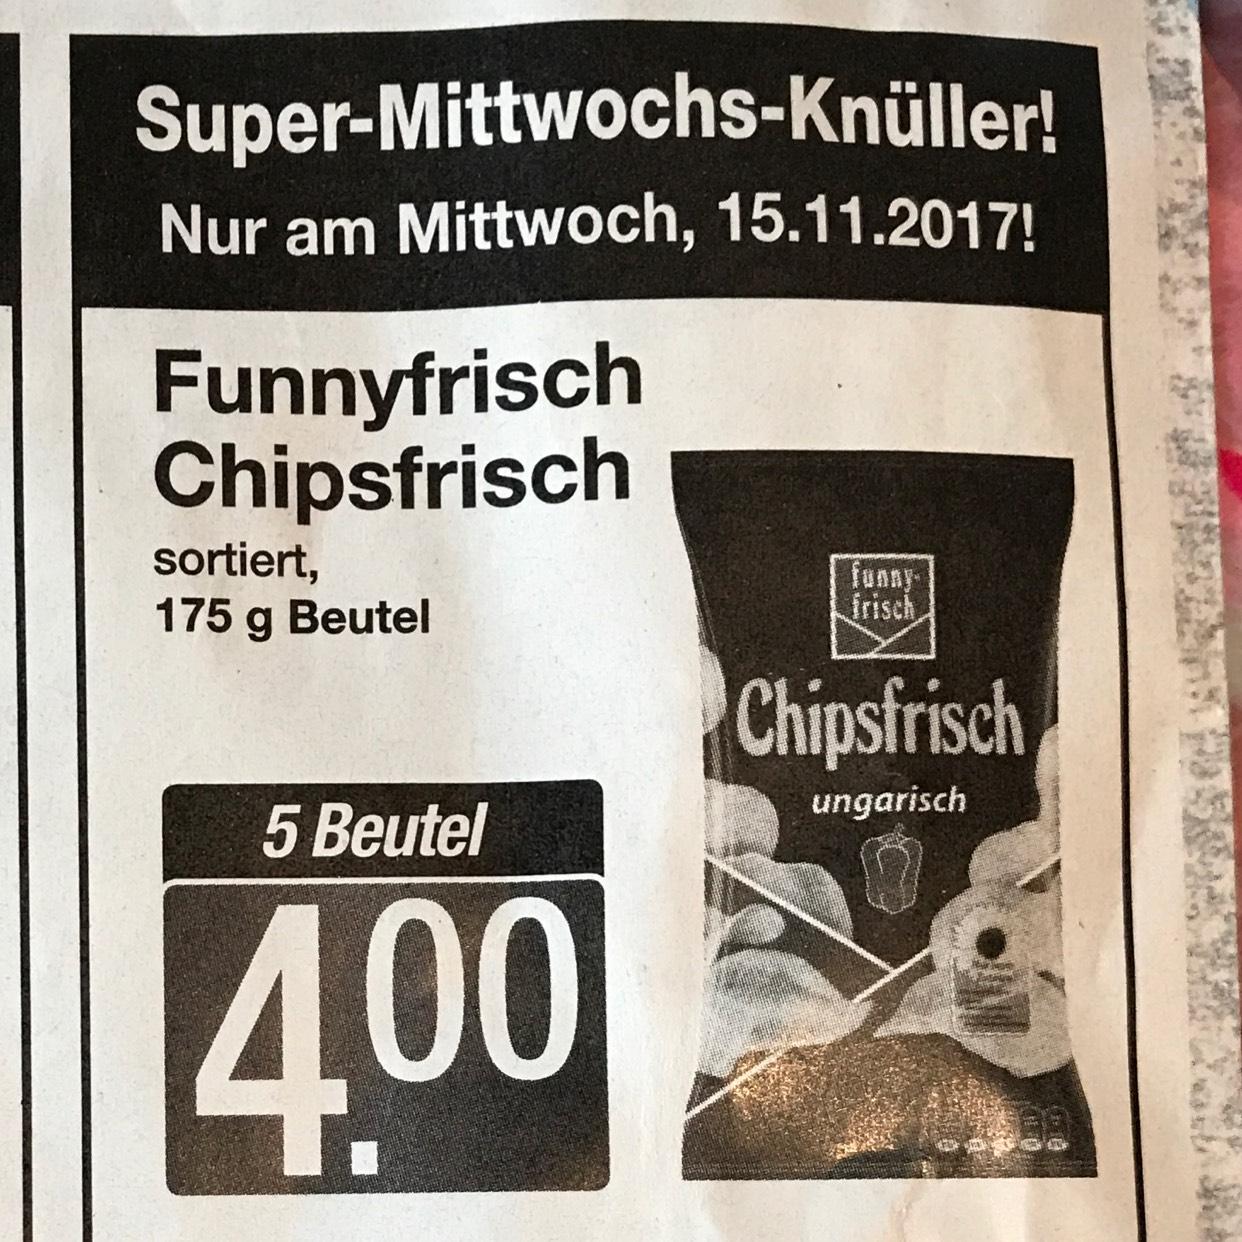 [Markant/ Lokal?] 5xFunny-Frisch für 4€